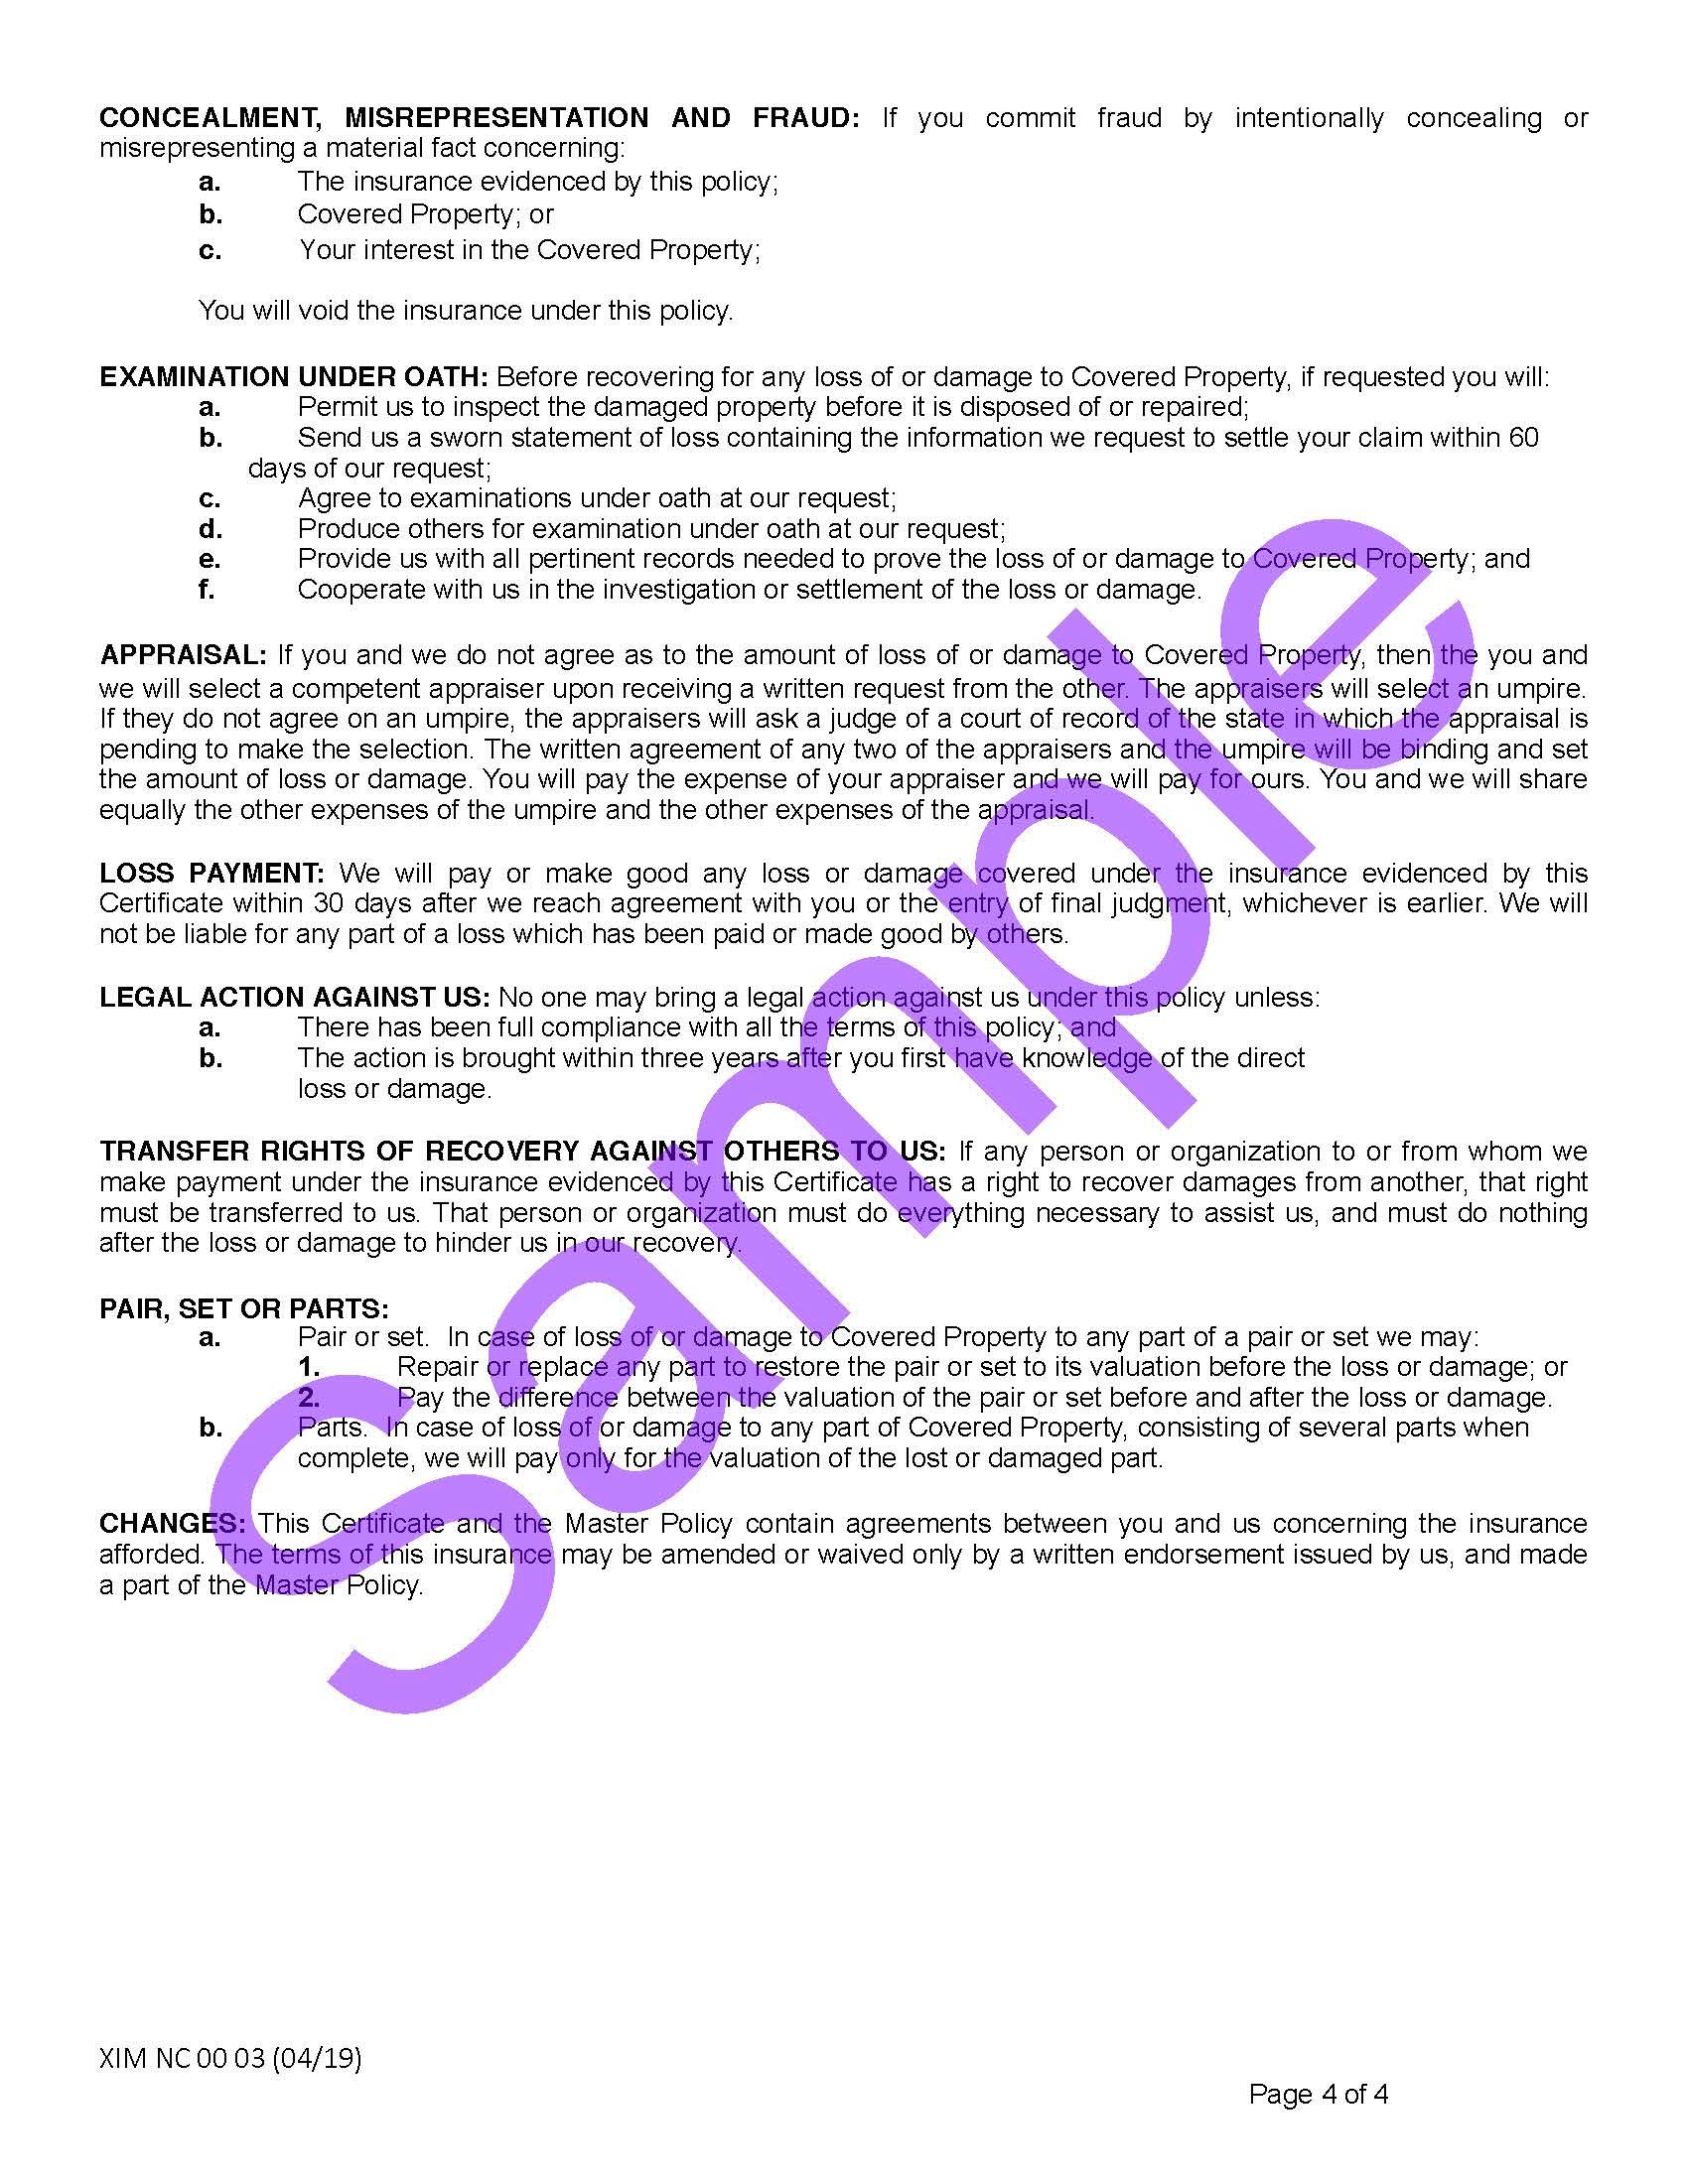 XIM NC 00 03 04 19 North Carolina Certificate of InsuranceSample_Page_4.jpg